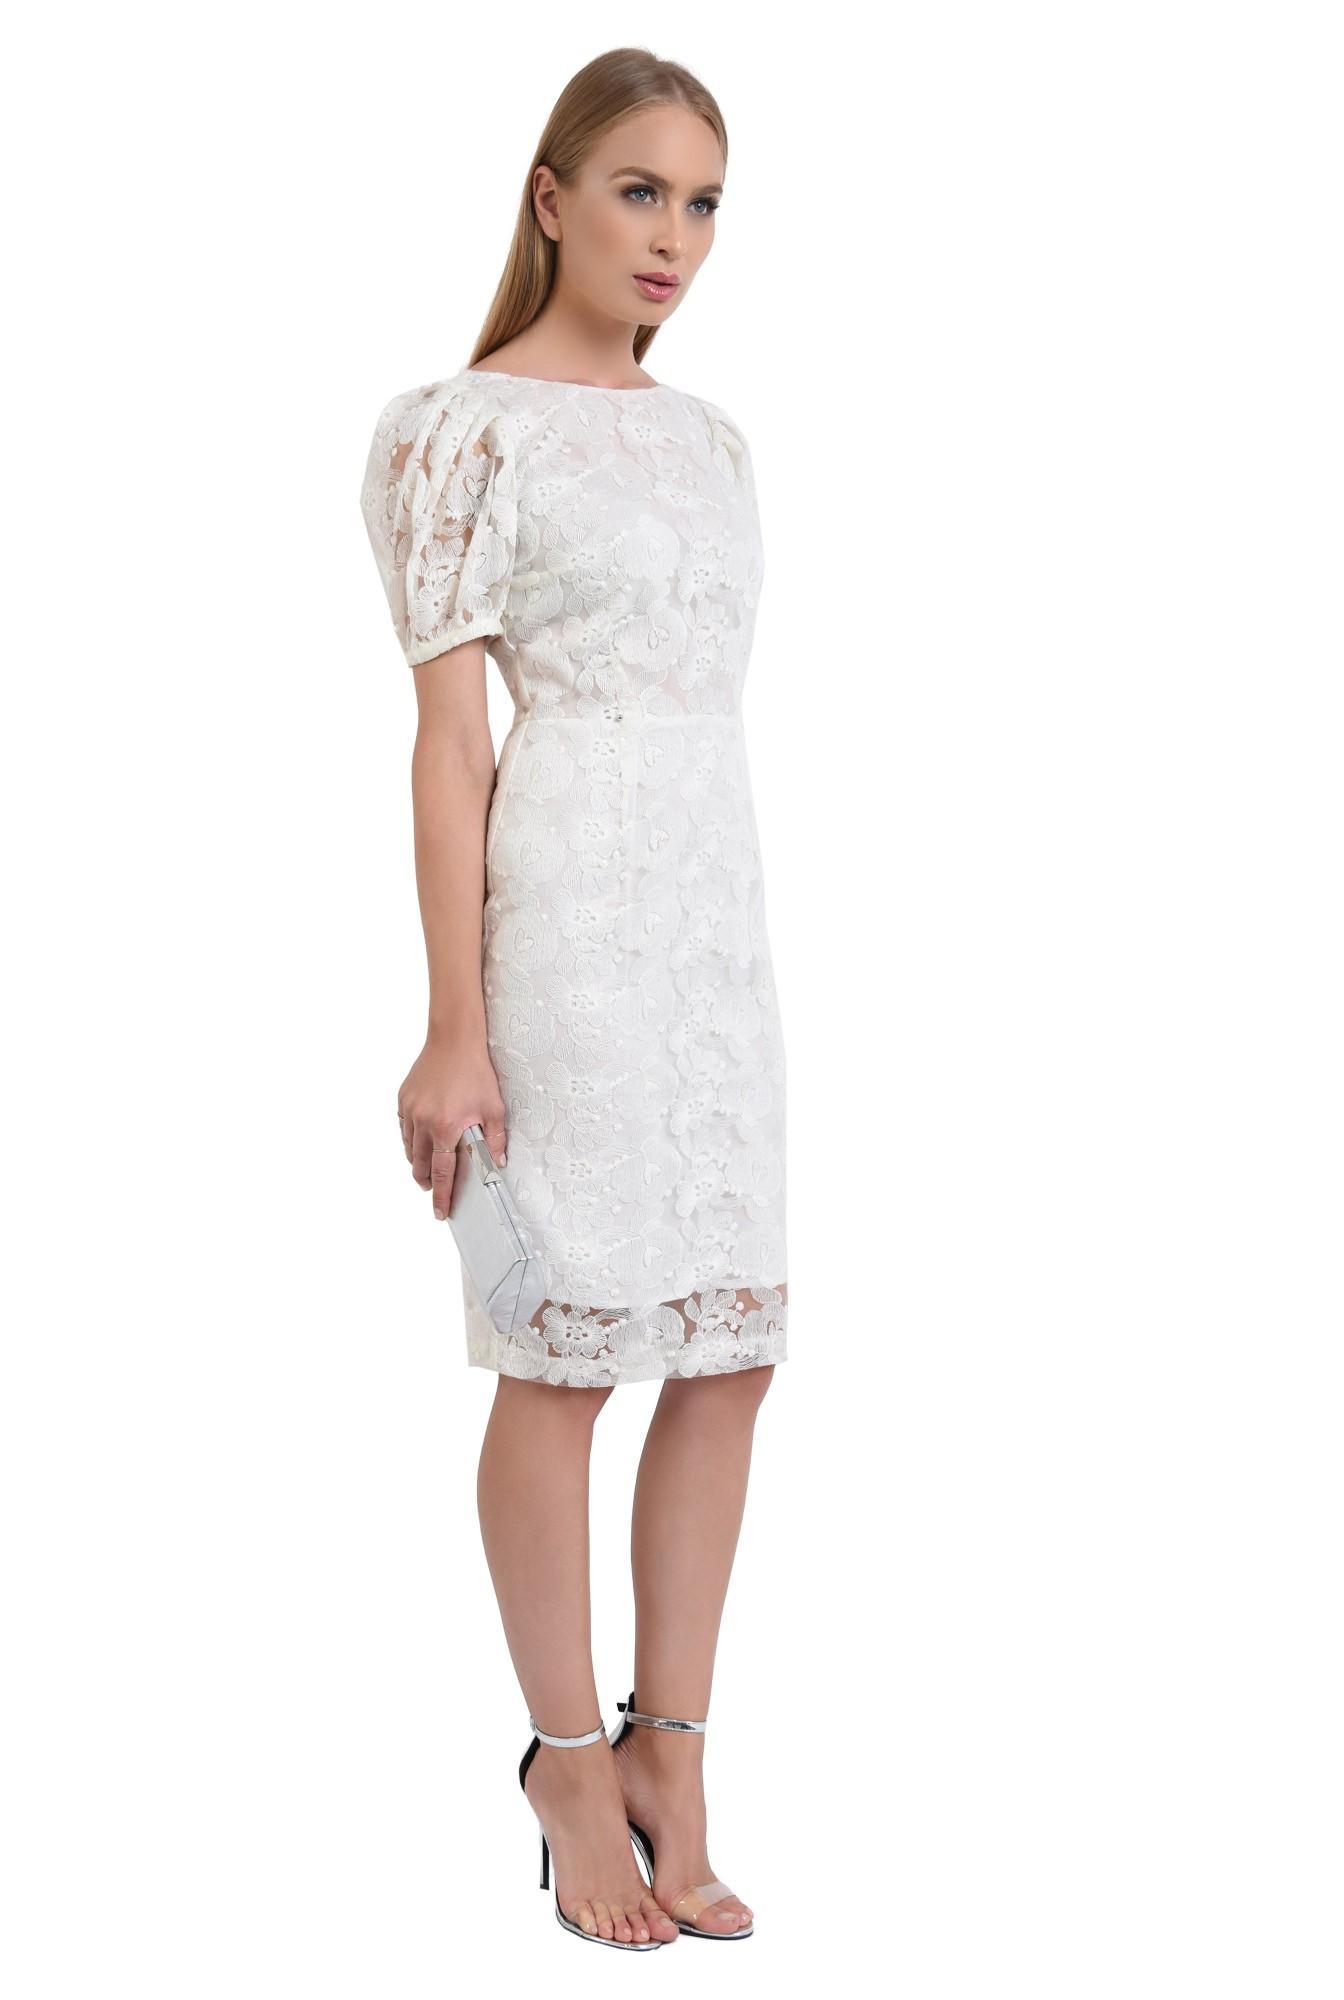 0 - rochie de seara, dantela, alb, conica